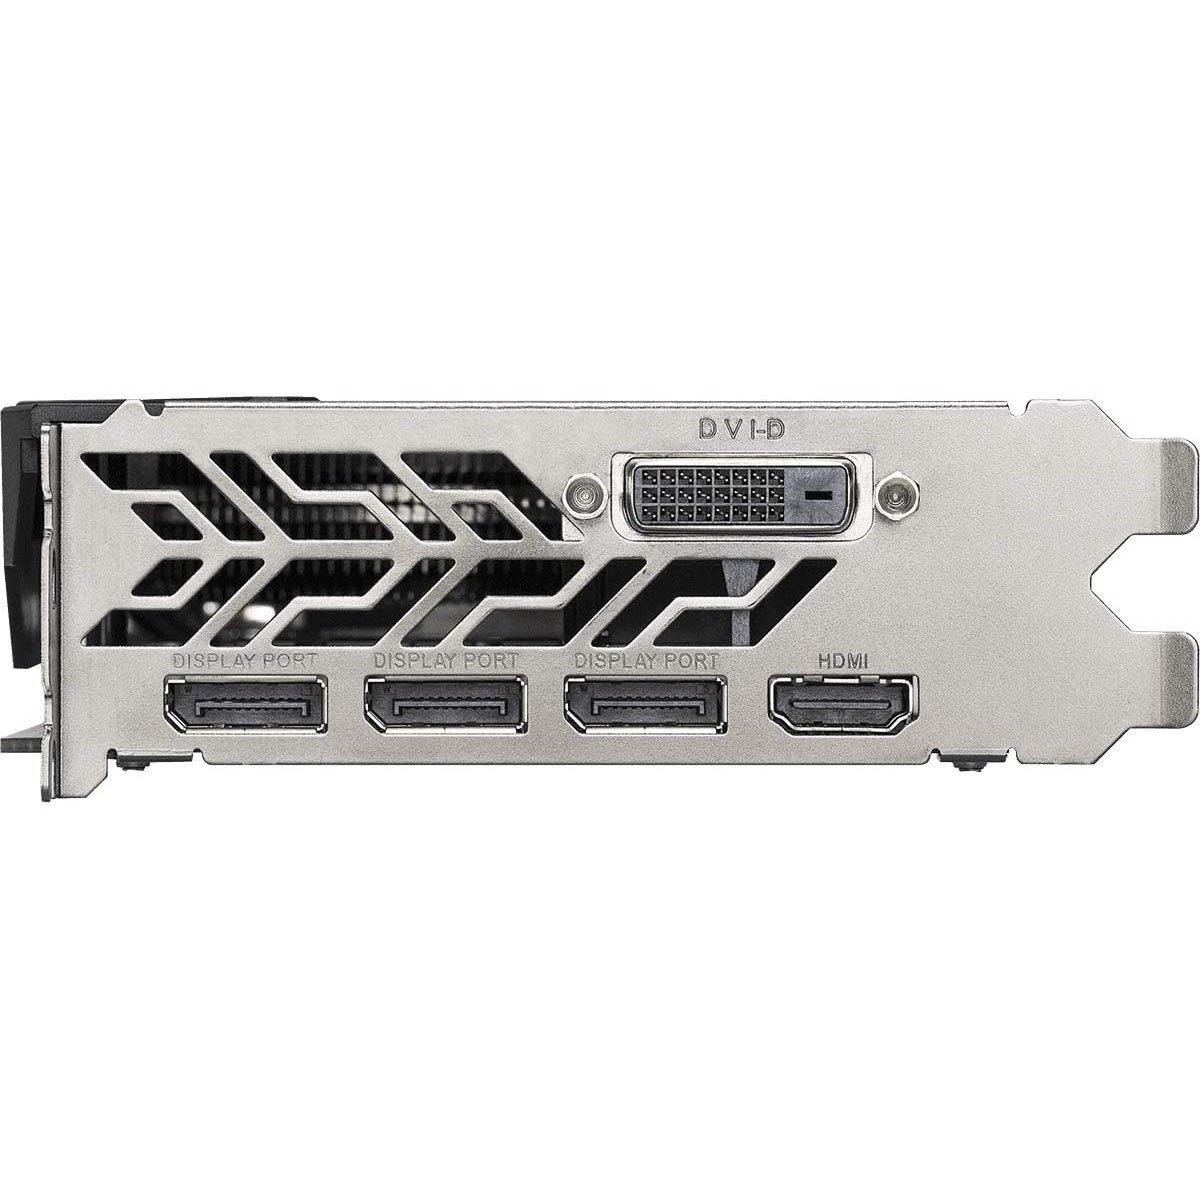 placa de video 4gb asrock rx 570 dual amd radeon phantom caming graphics card 2000mhz 256bit gddr6 dp dvi hdmi 51080 2000 203646